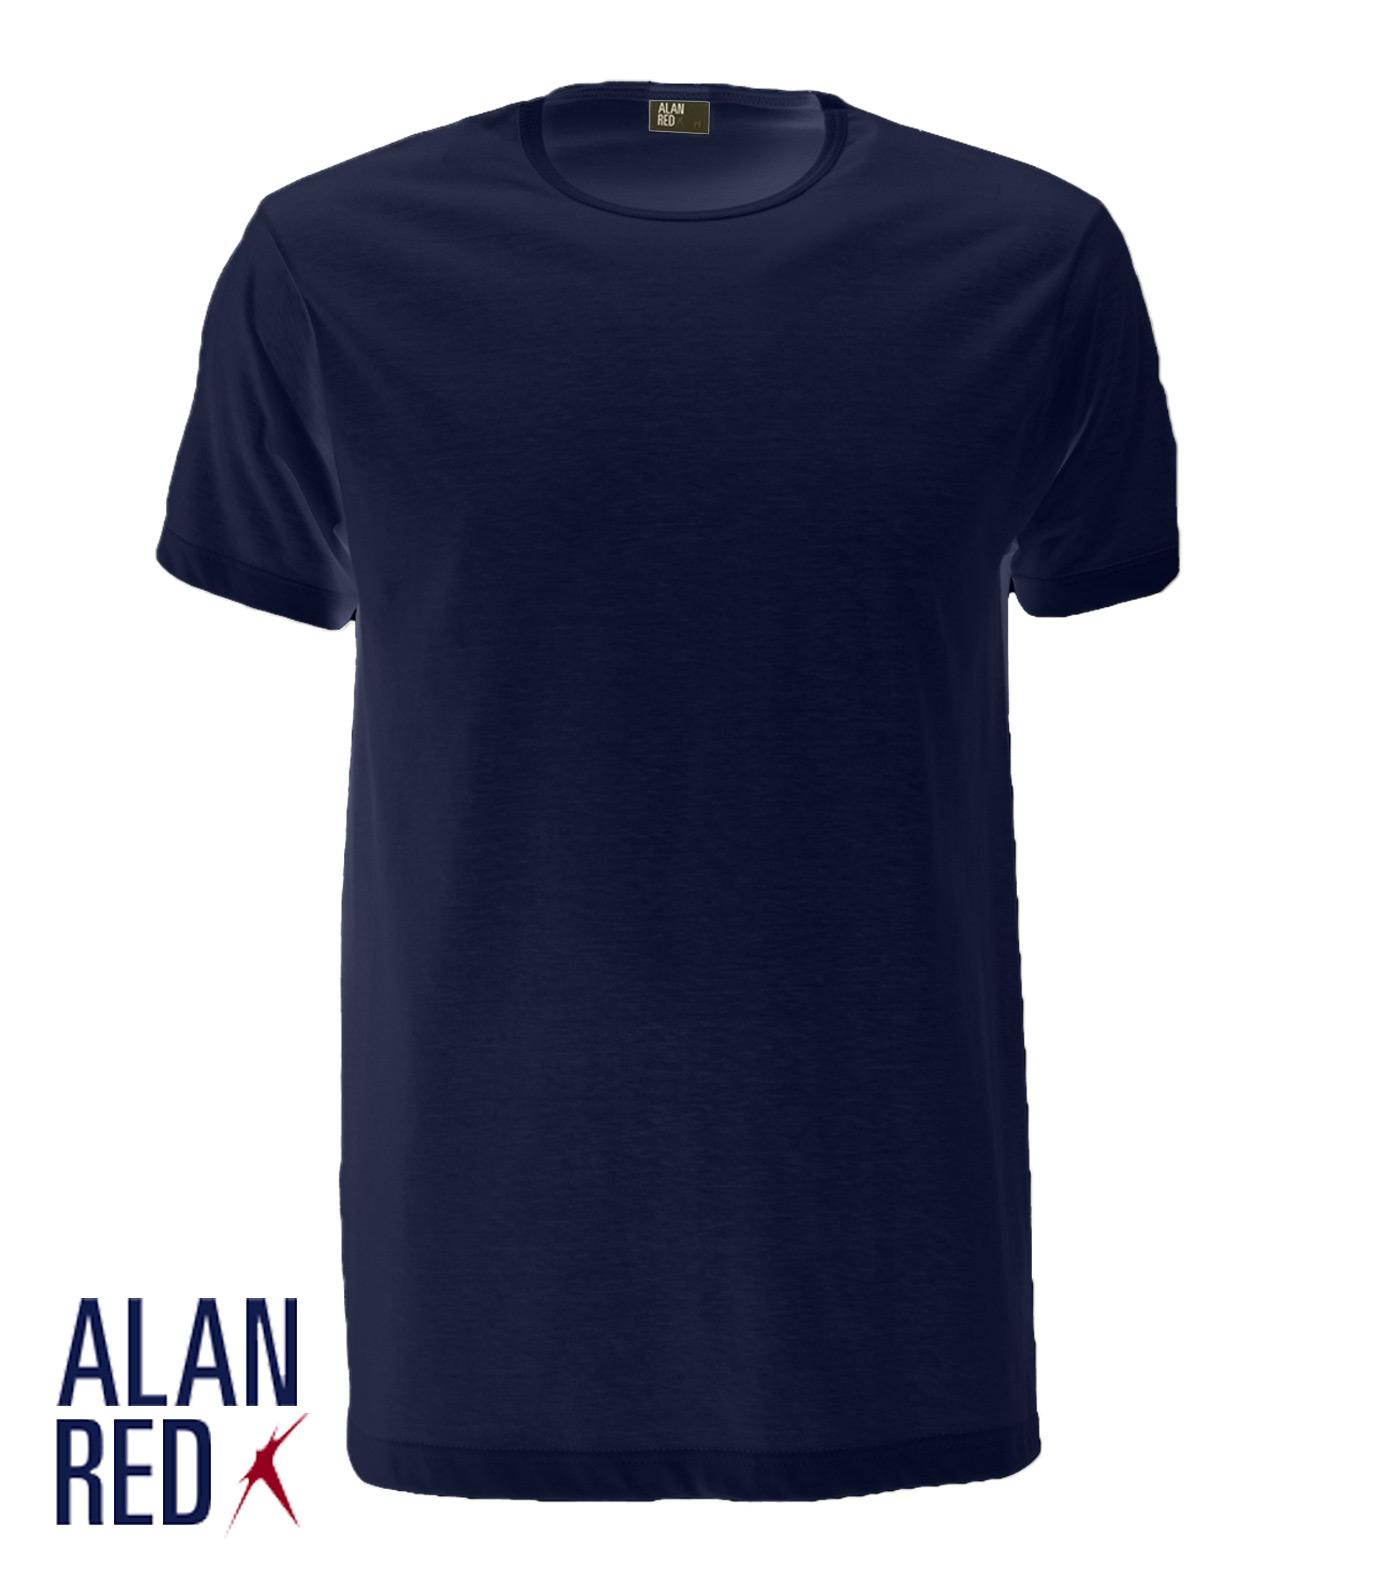 Alan Red Derby - navy 1-pack